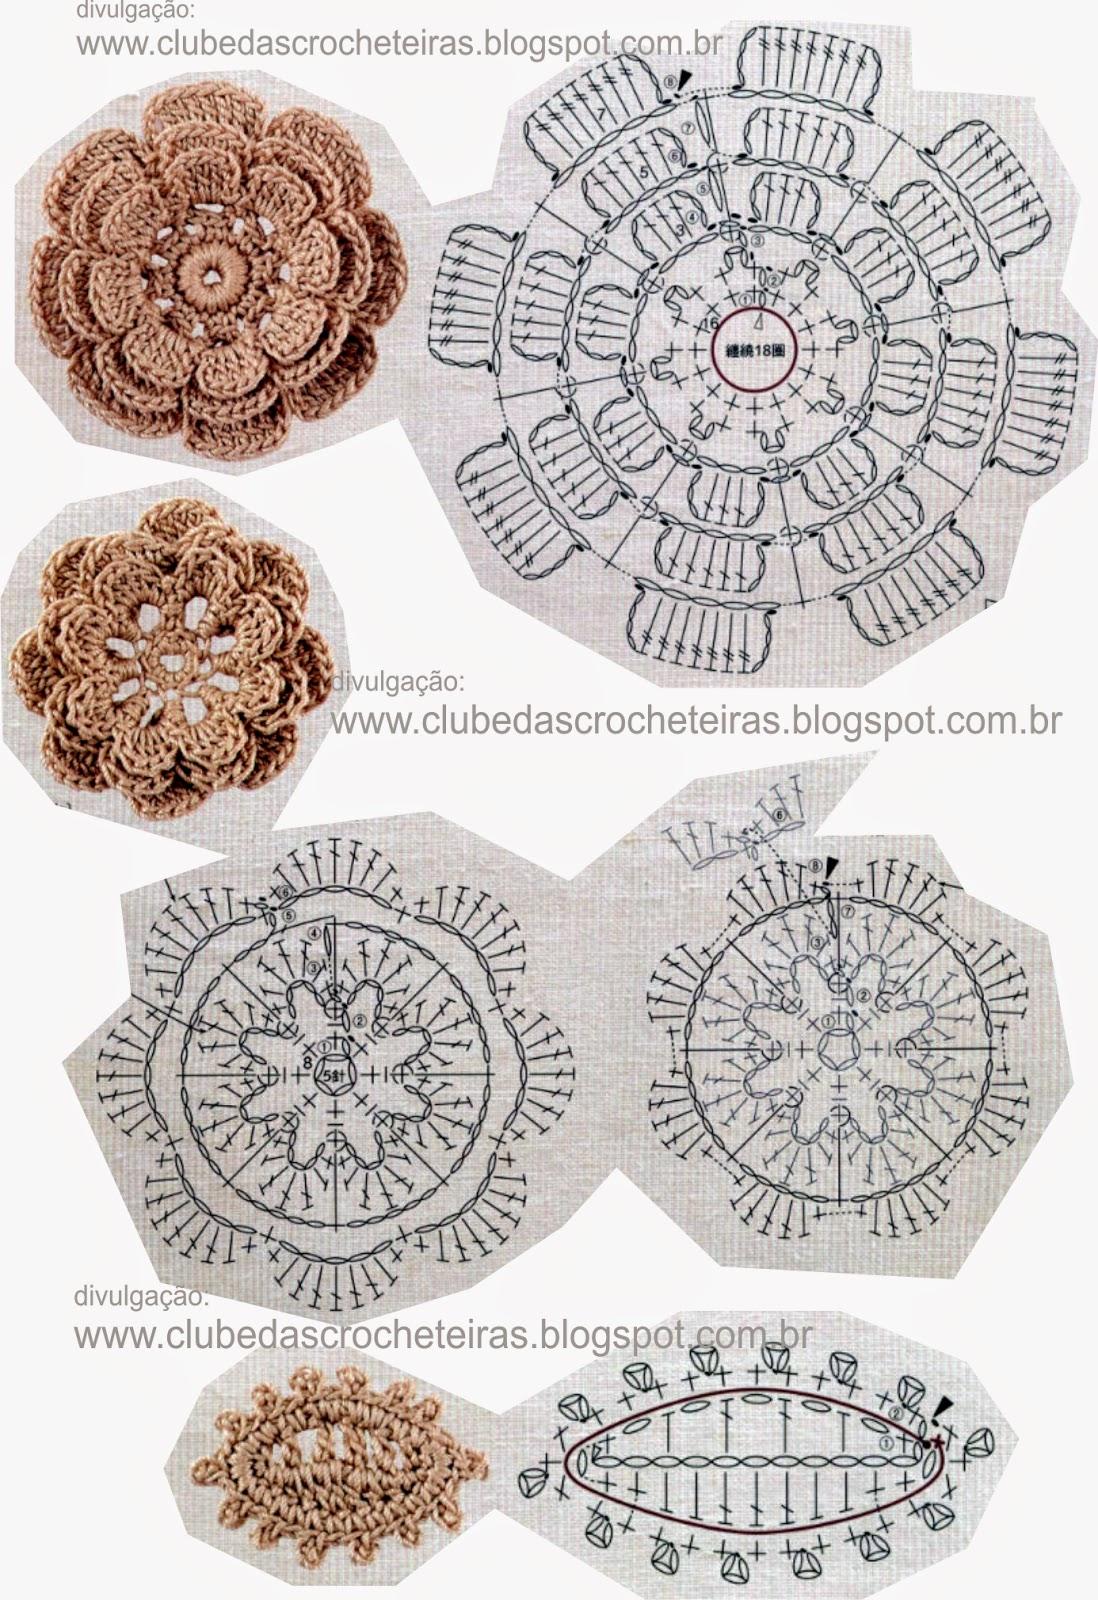 Ergahandmade Crochet Scarf Diagrams Stitches Diagram